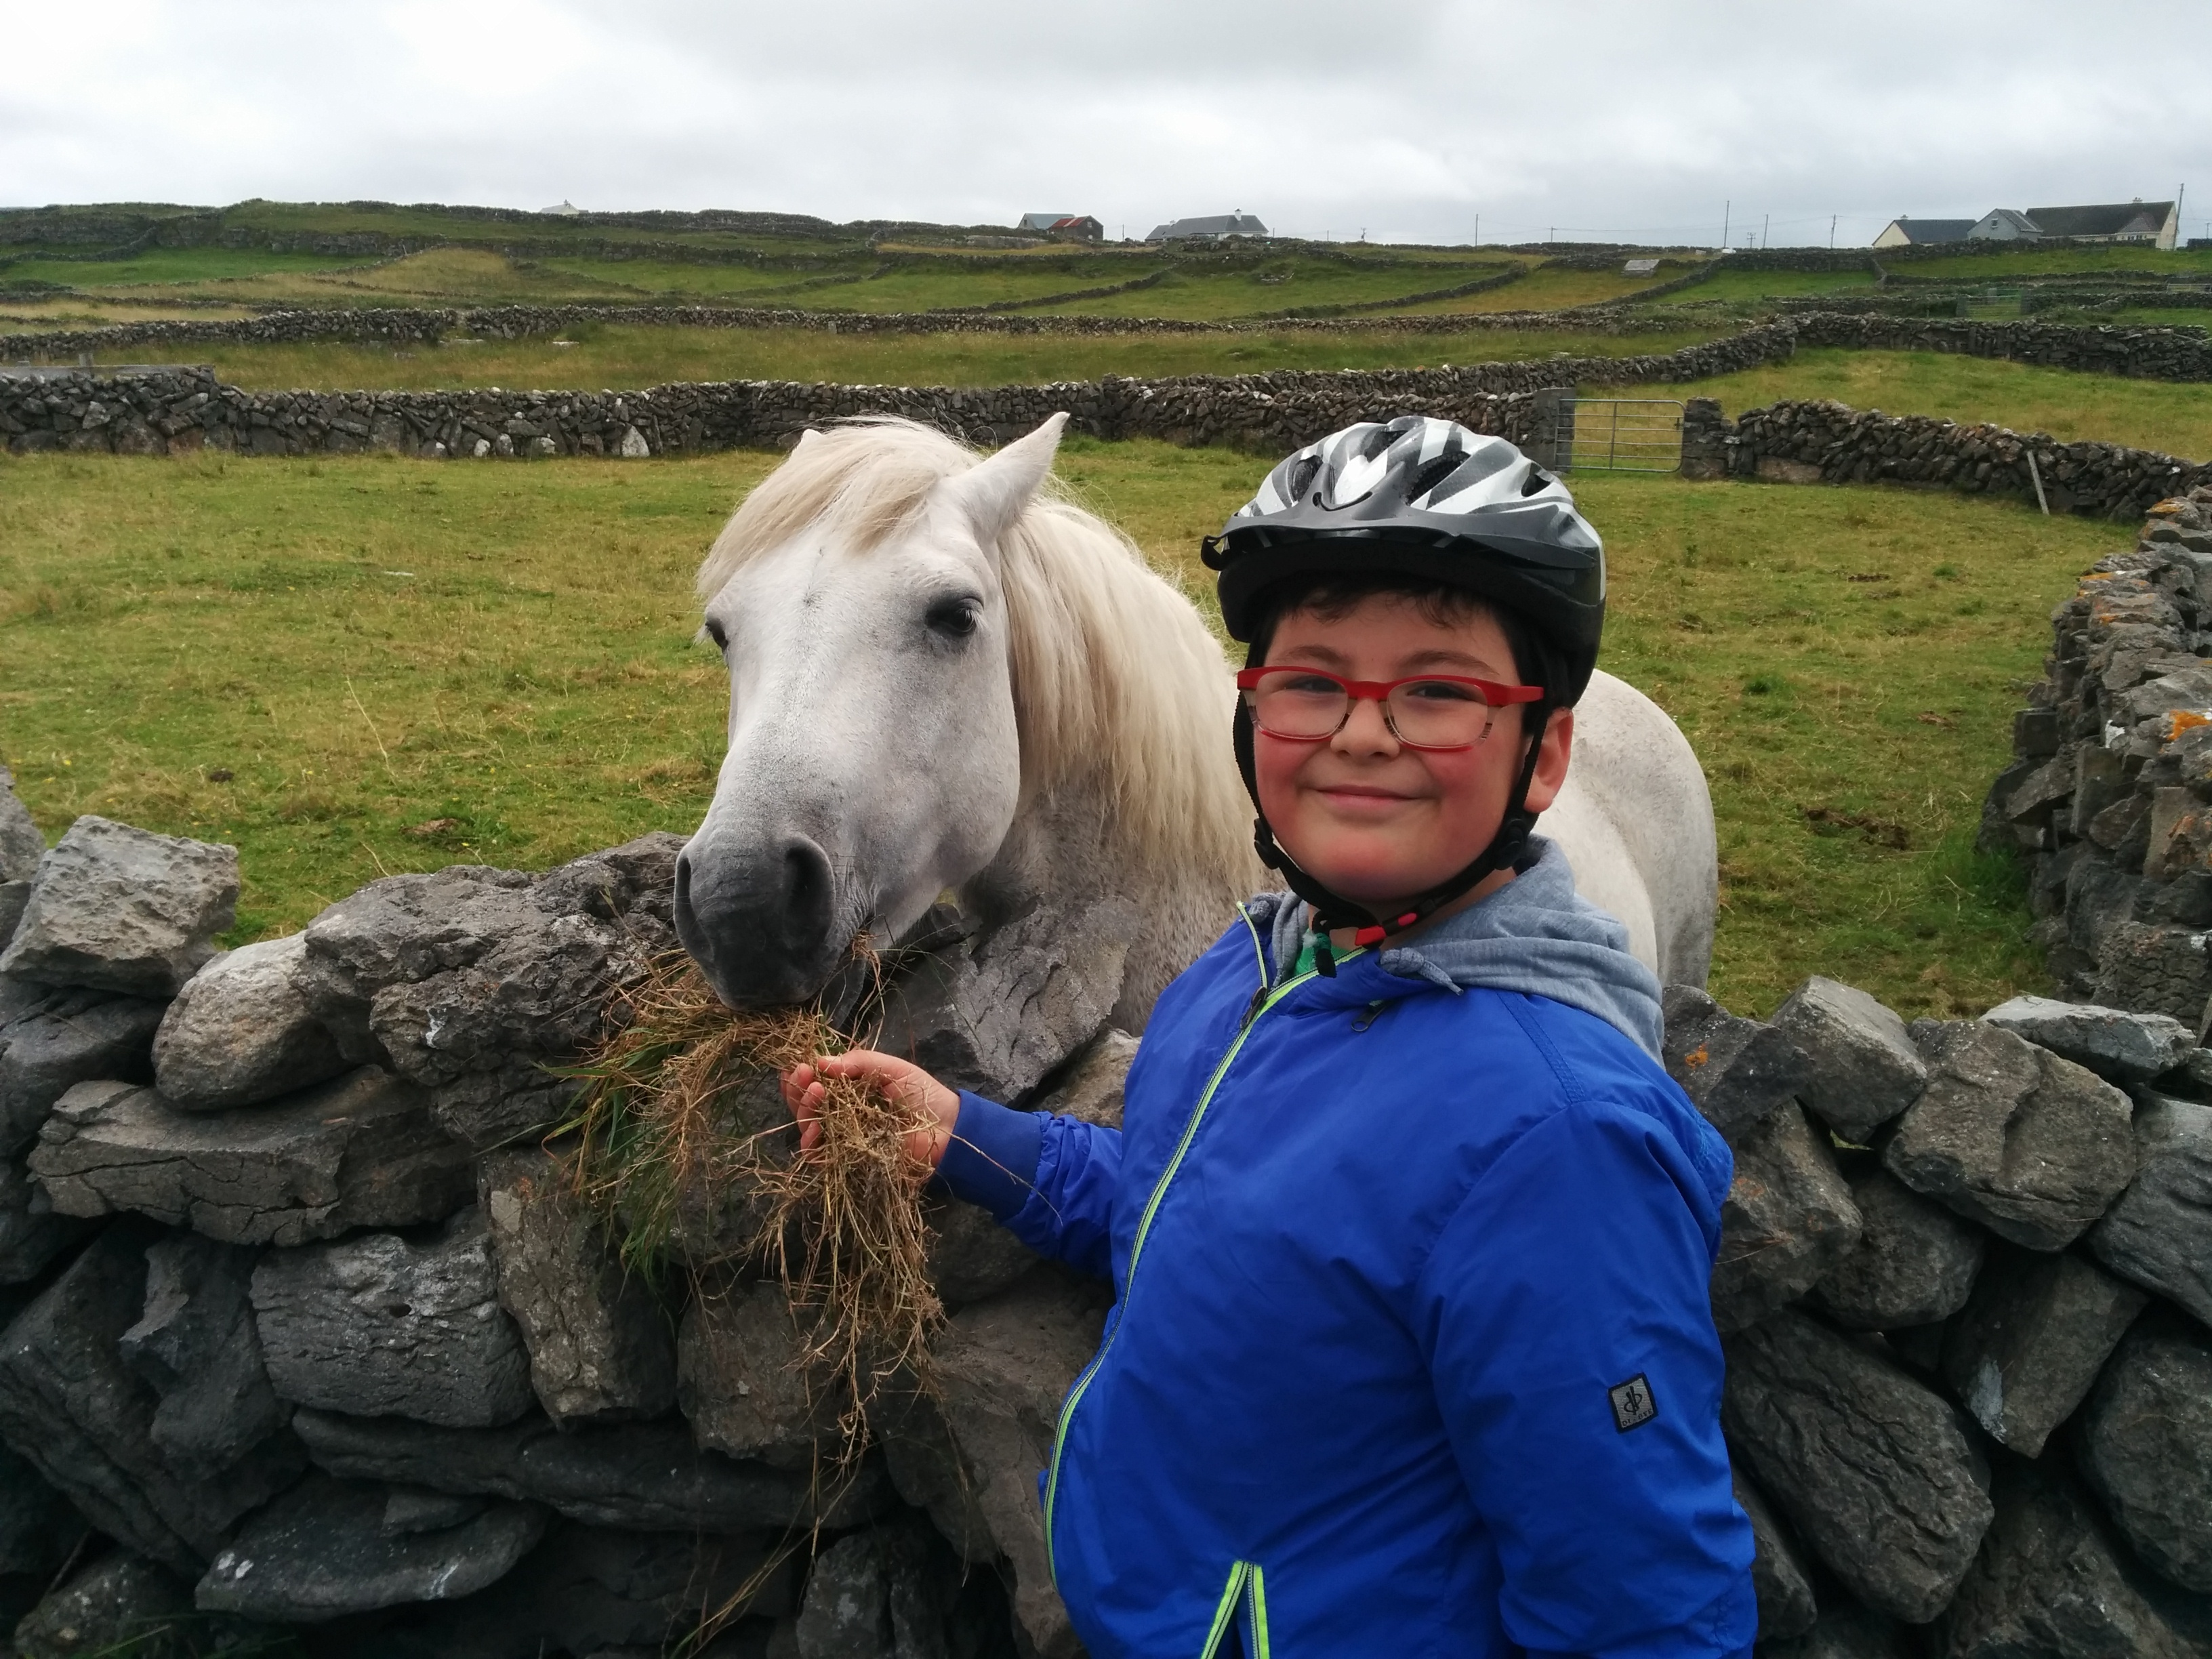 Eoghan Rincon enjoying life after learning English in Galway - Atlantic Language School